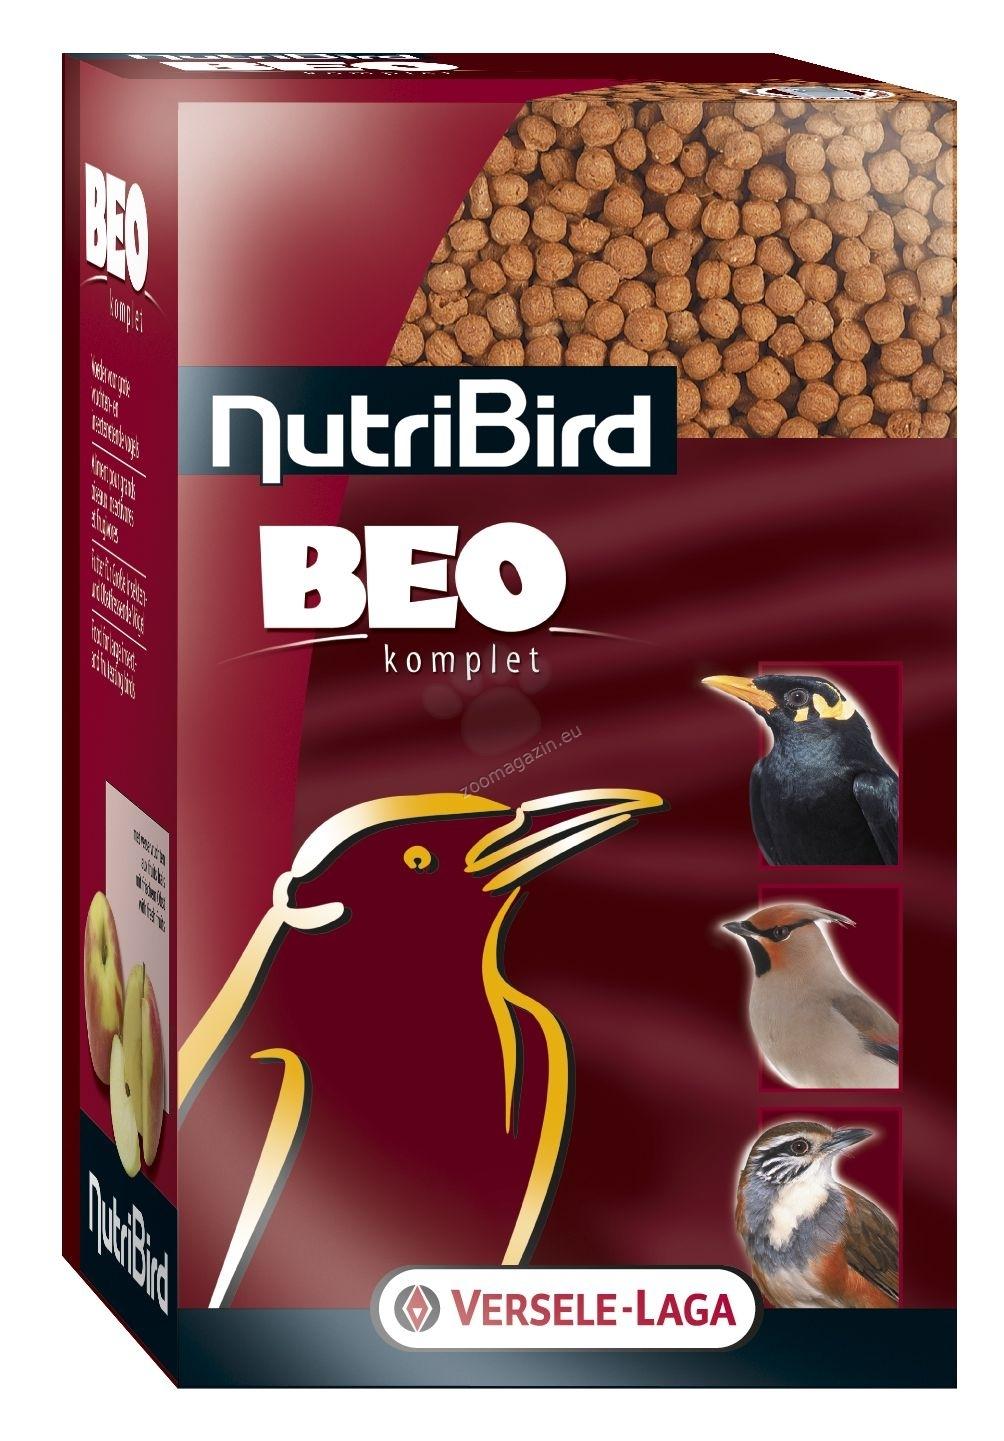 Versele Laga - Nutribird Beo komplet - пълноценна екструдирана храна за мейна и други големи насекомоядни и плодоядни птици  500 гр.